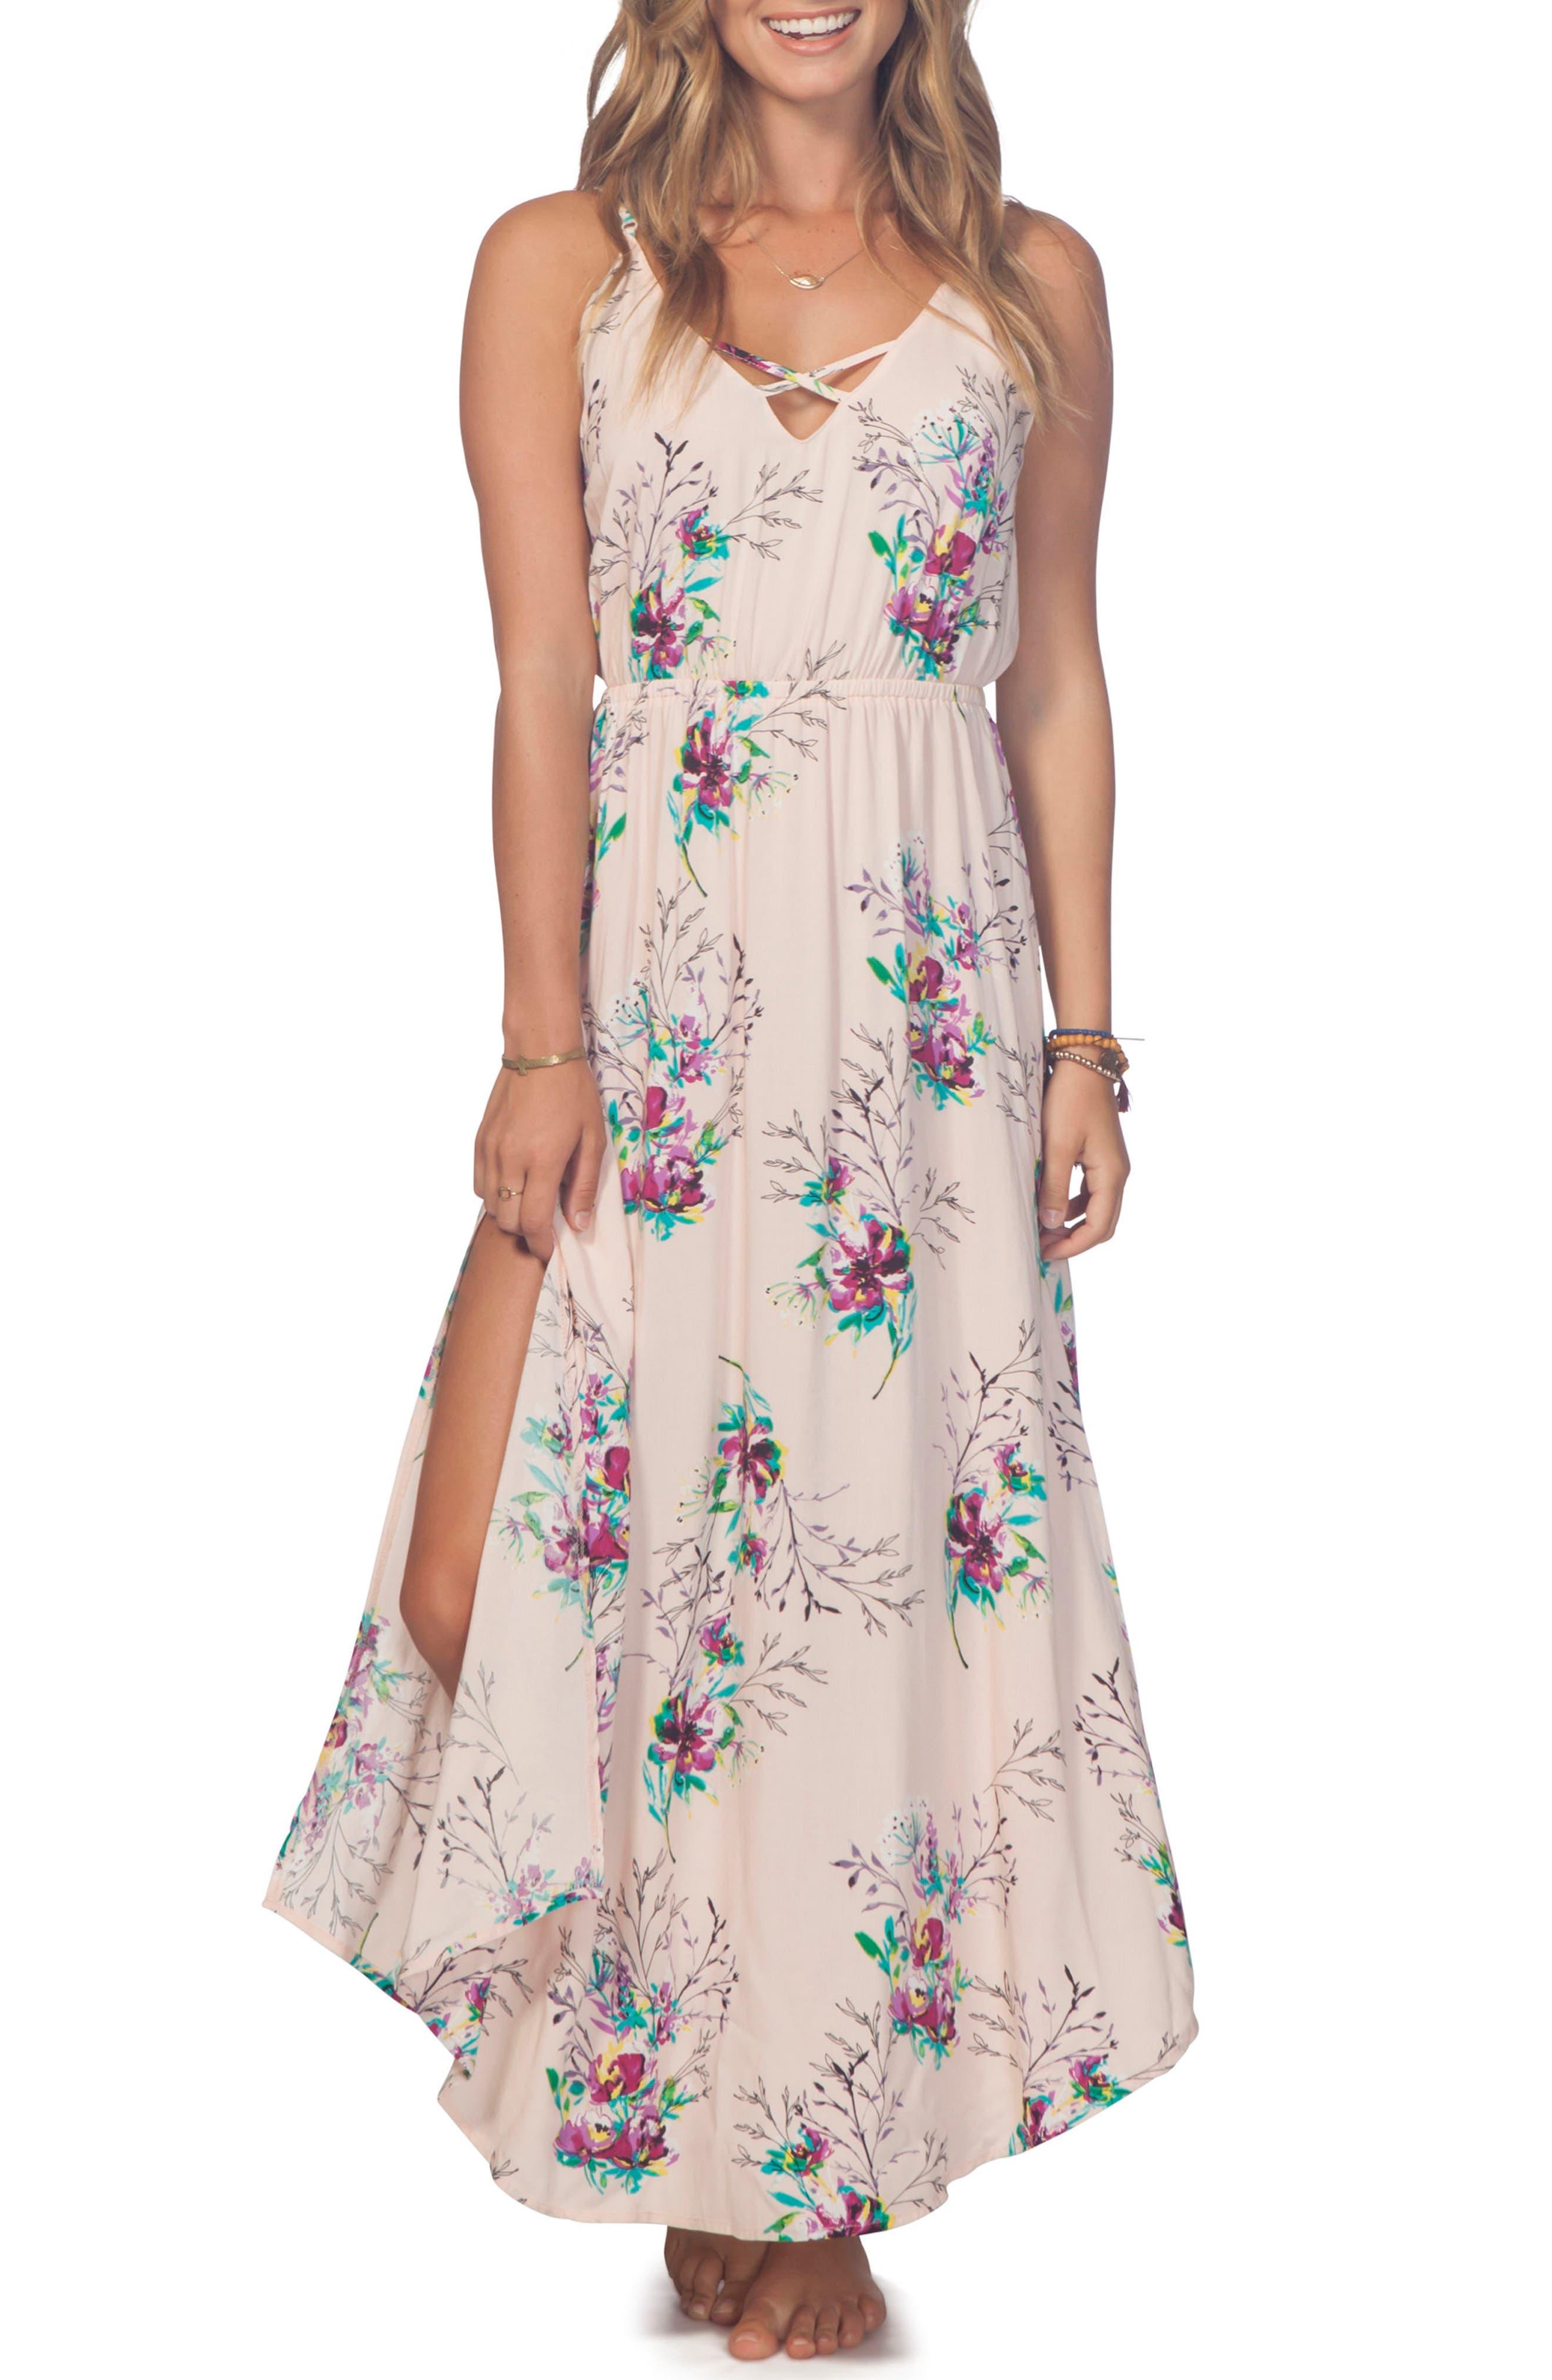 Sweet Nothing Maxi Dress,                             Main thumbnail 1, color,                             900